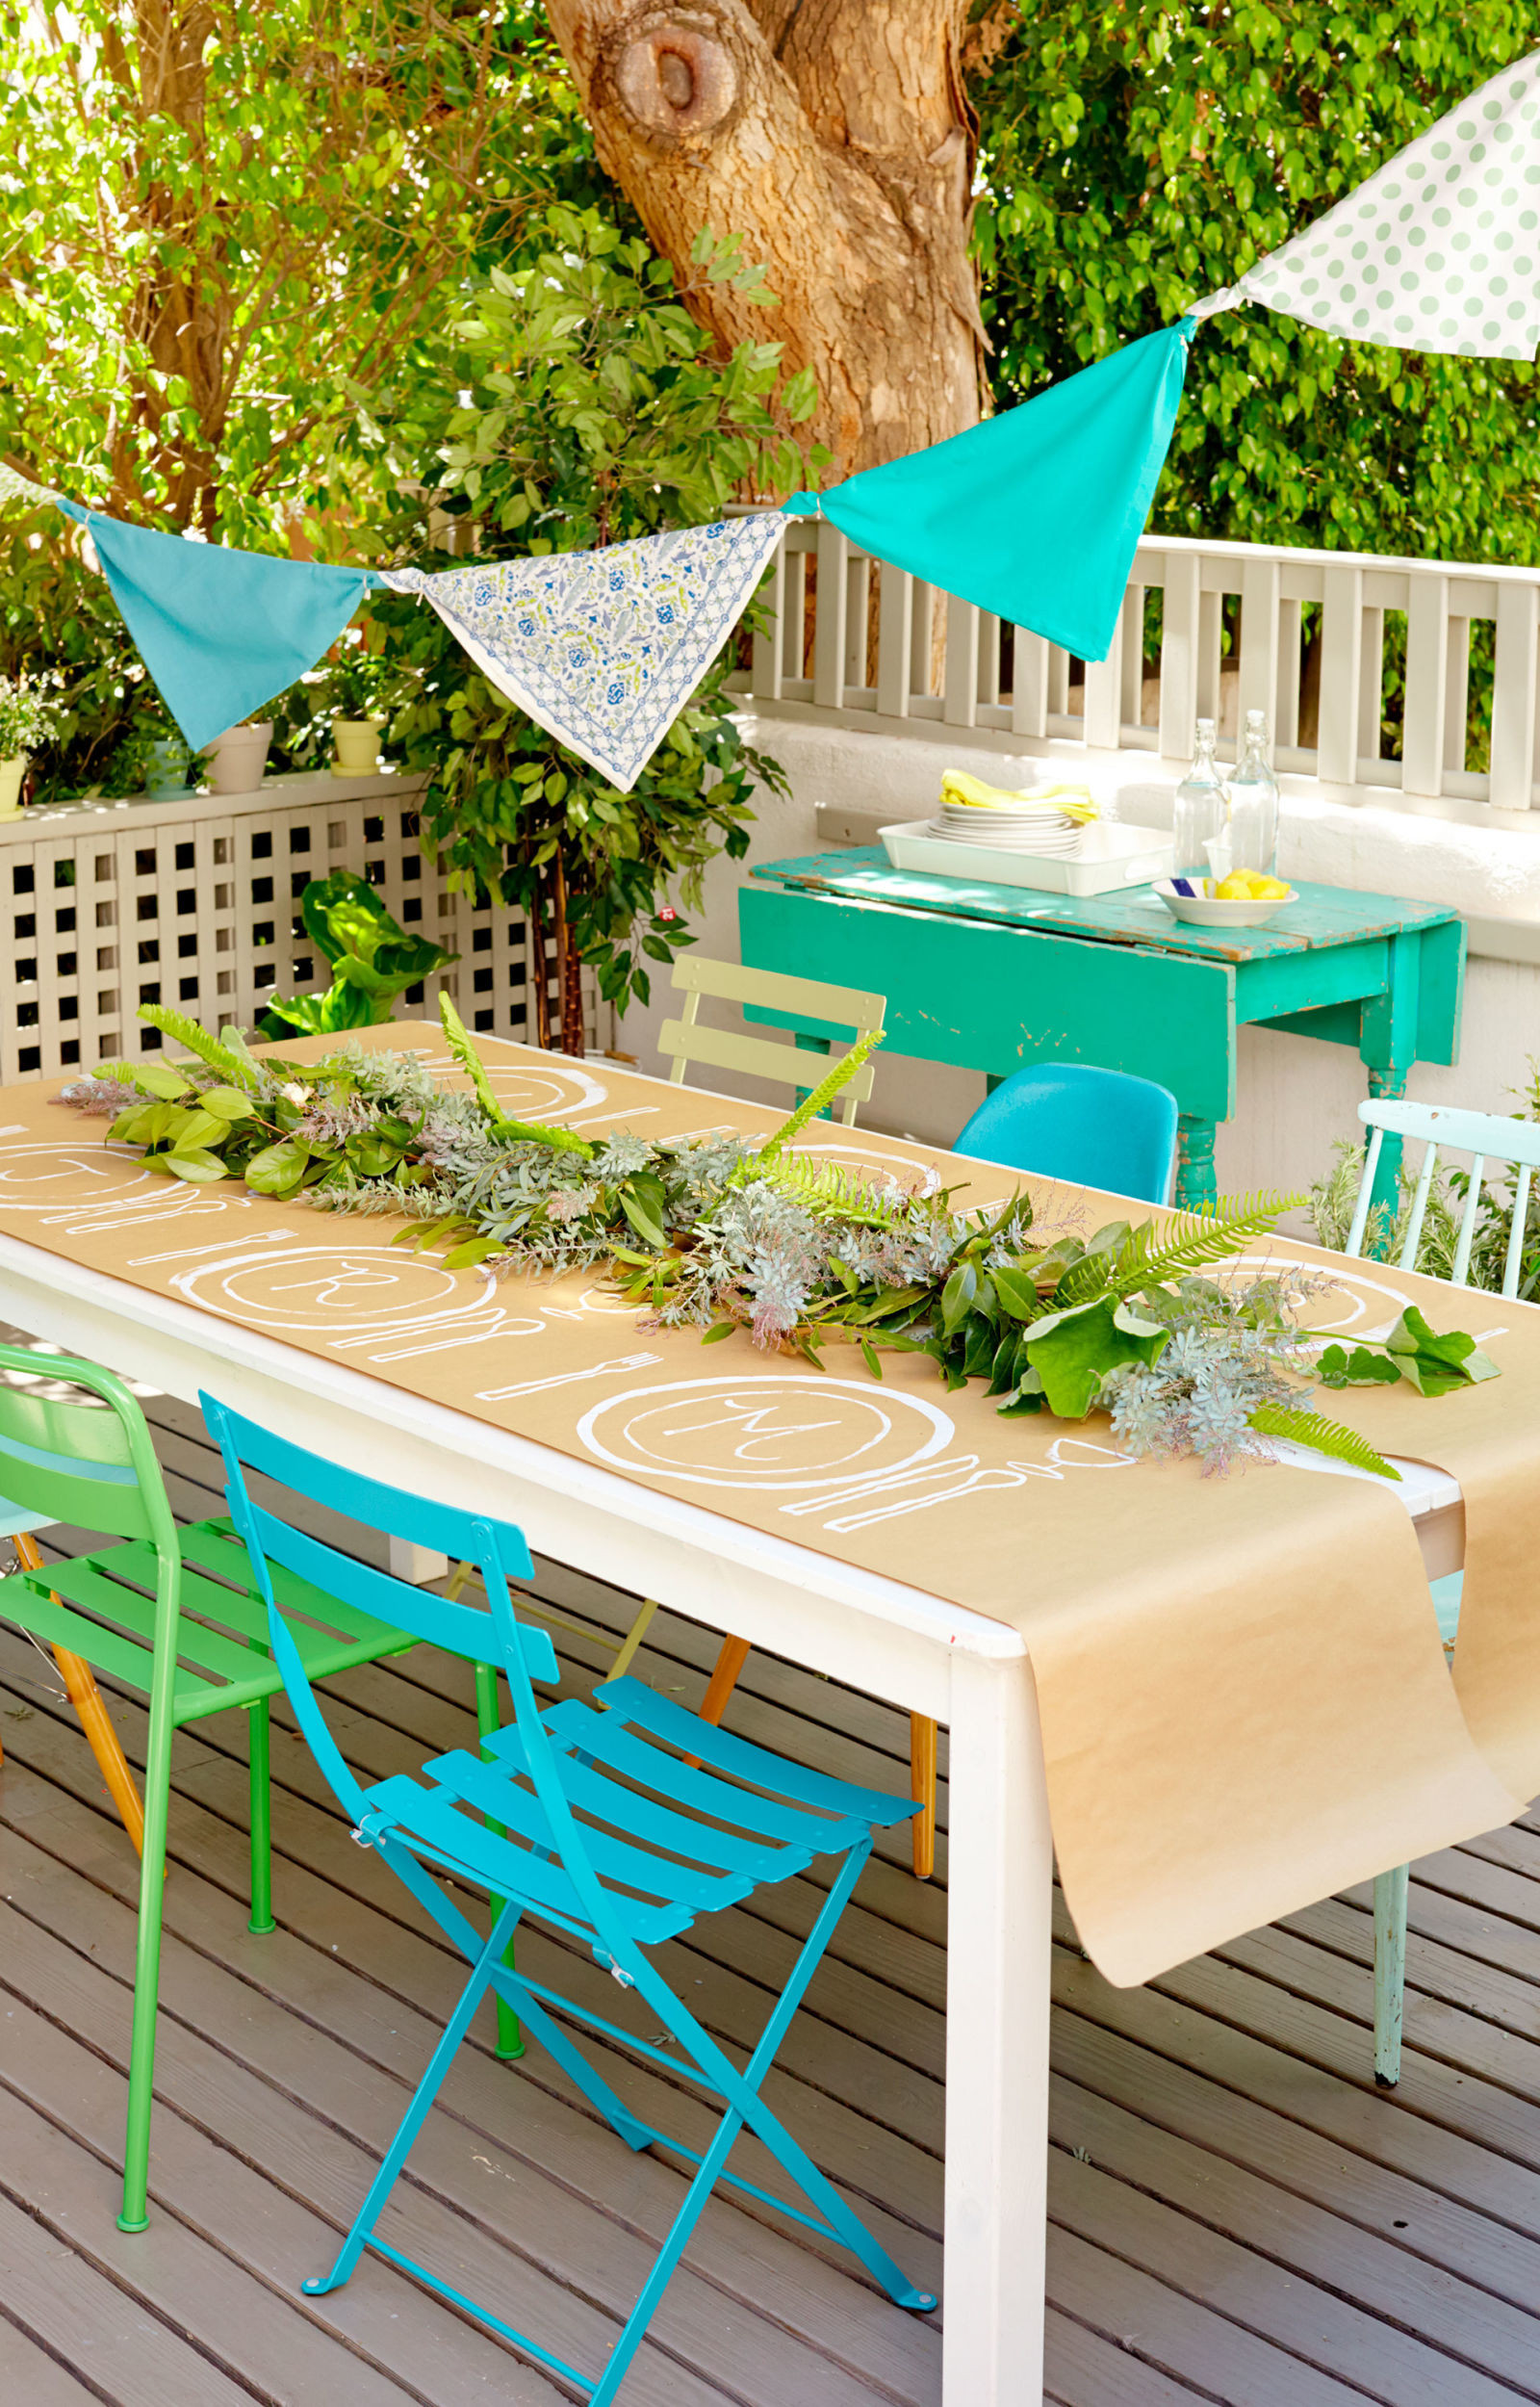 Party In Backyard Ideas  Backyard Party Ideas And Decor Summer Entertaining Ideas